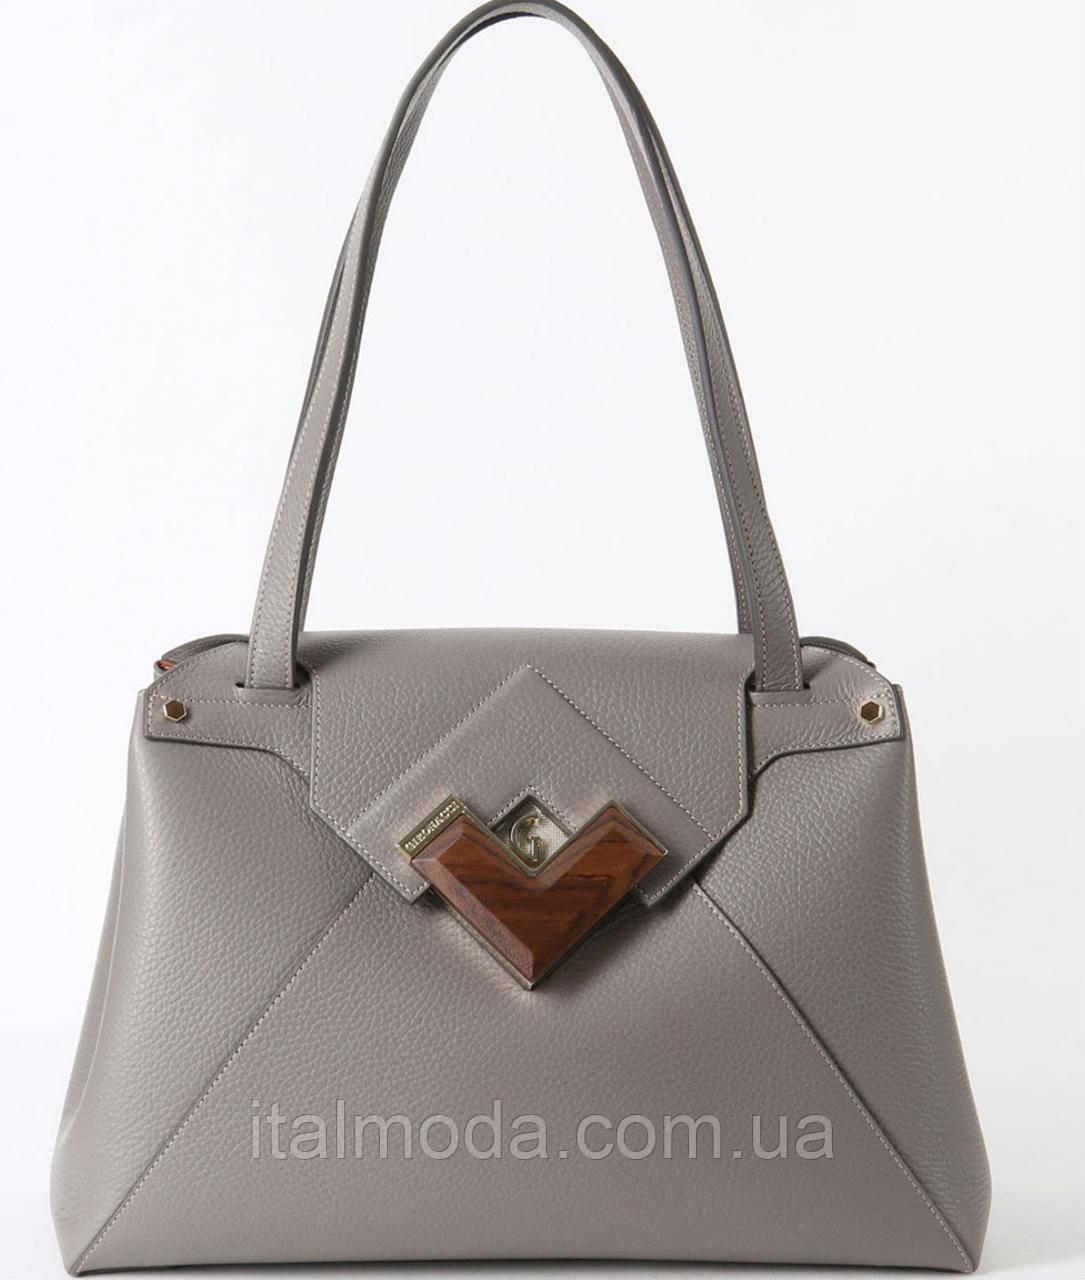 63c2f8c9a768 Женская сумка Gironacci 1192: продажа, цена в Киеве. женские сумочки ...